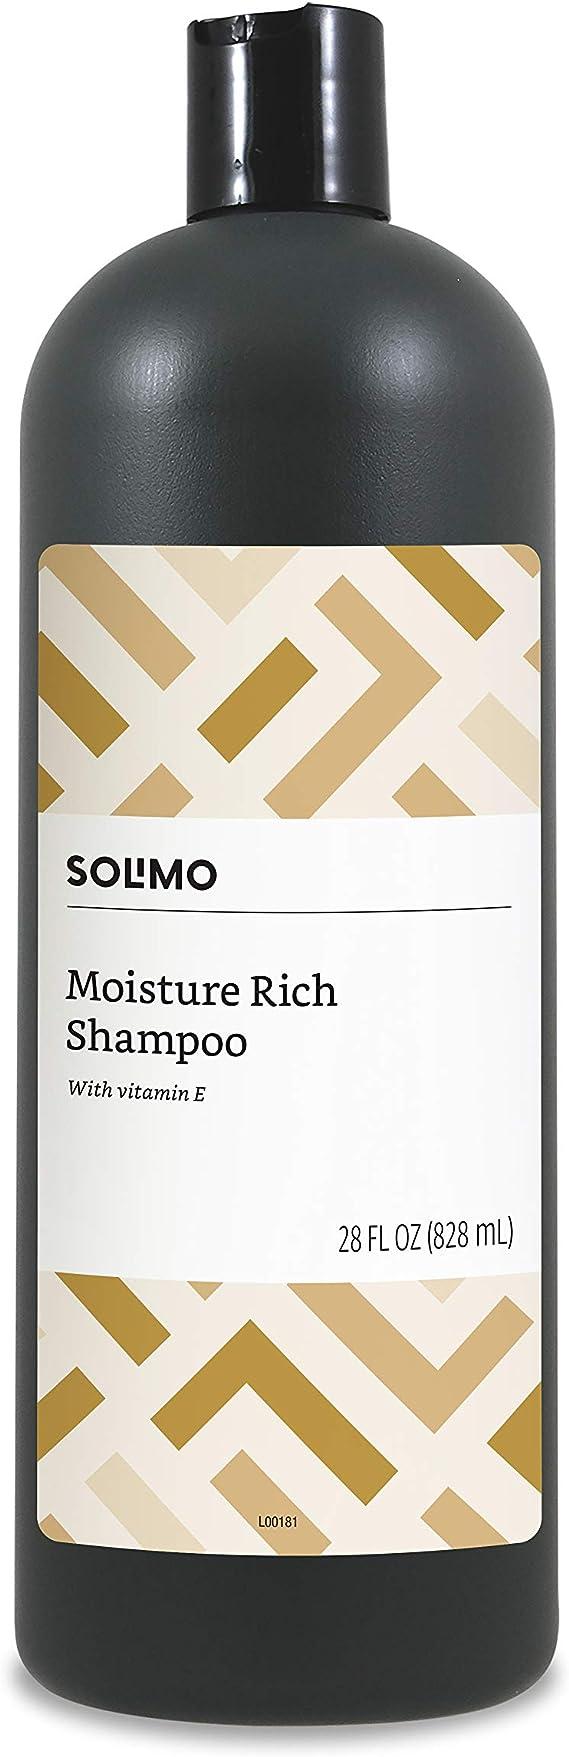 Amazon Brand - Solimo Moisture Rich Shampoo